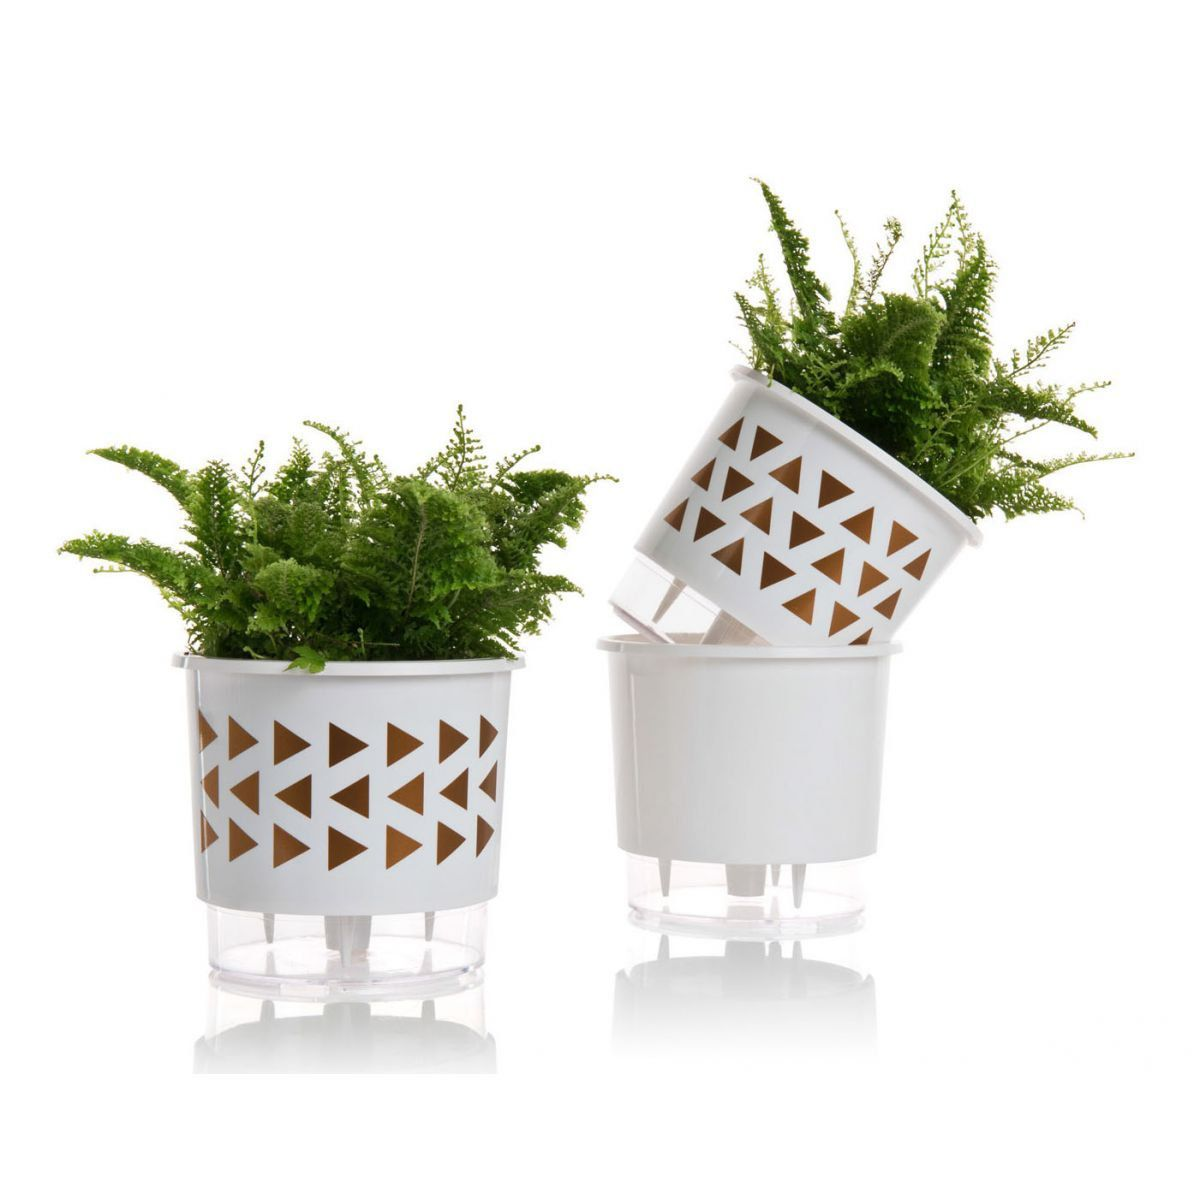 Kit 3 Vasos Autoirrigáveis Pequenos N02 12 cm x 11 cm Geométricos Branco